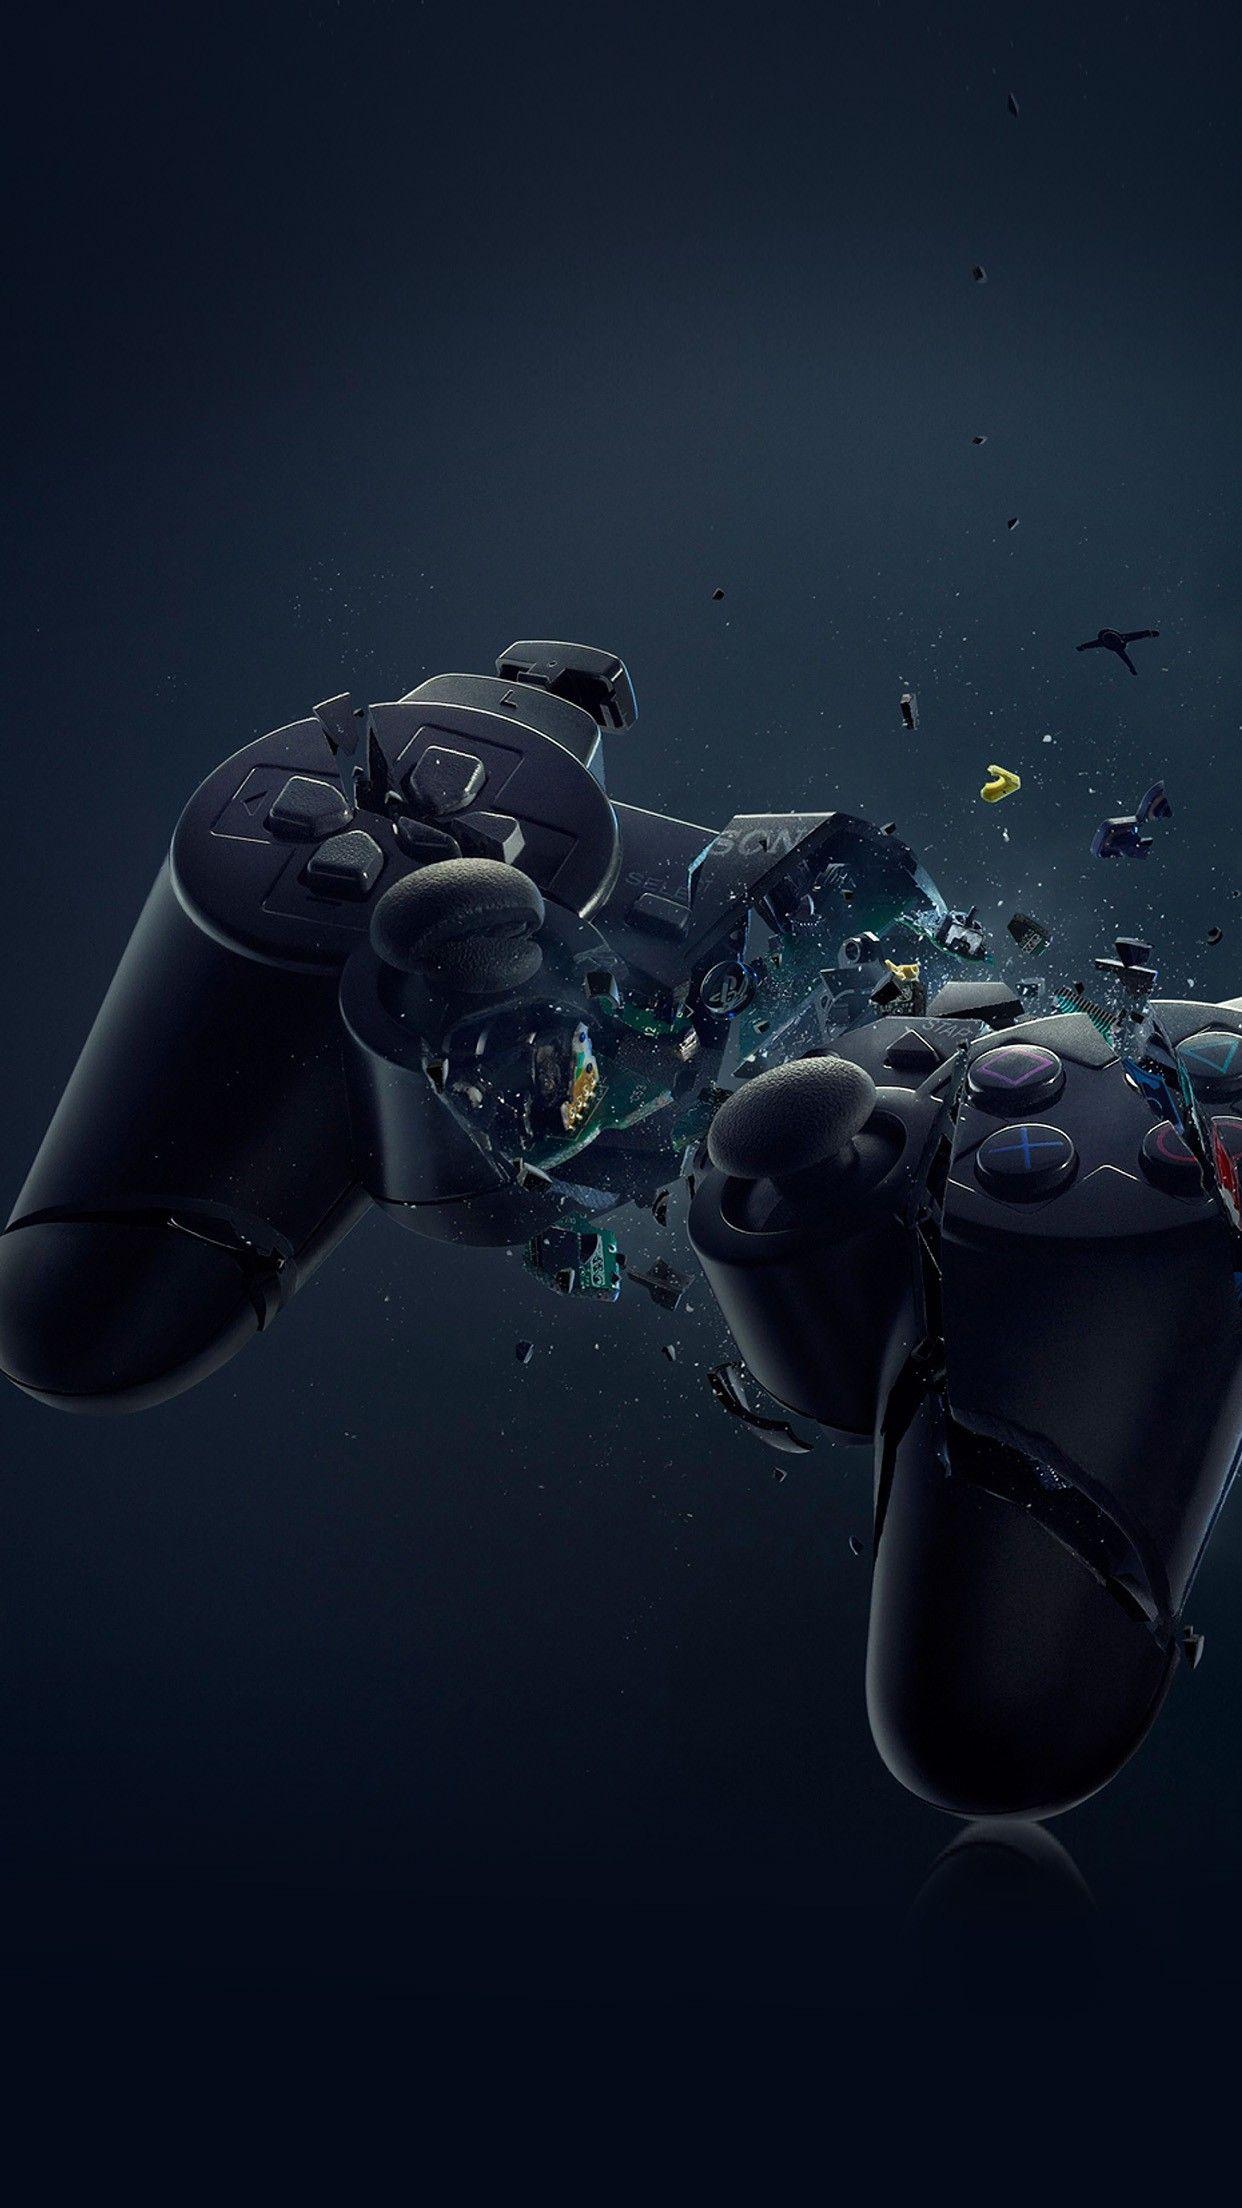 PS3 Broken Joystick Illustration Games Art Smartphone